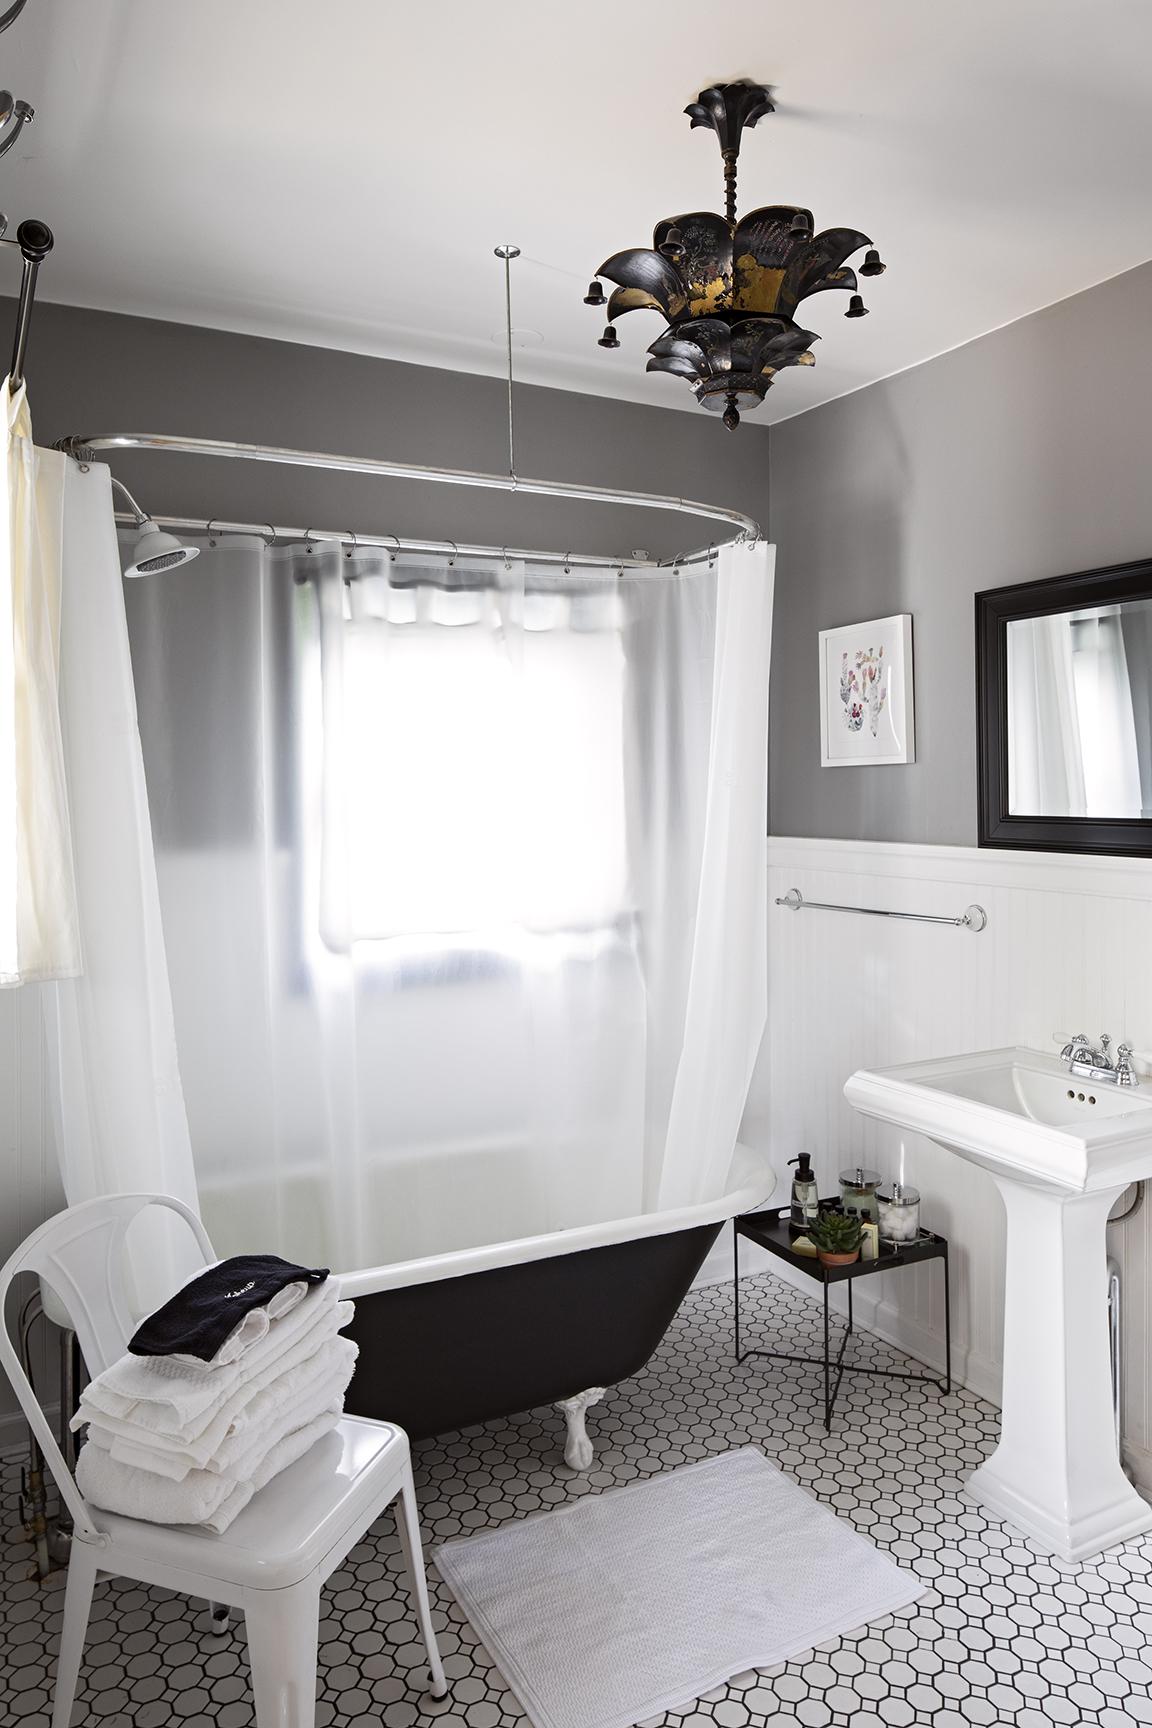 moonriver inn bathroom